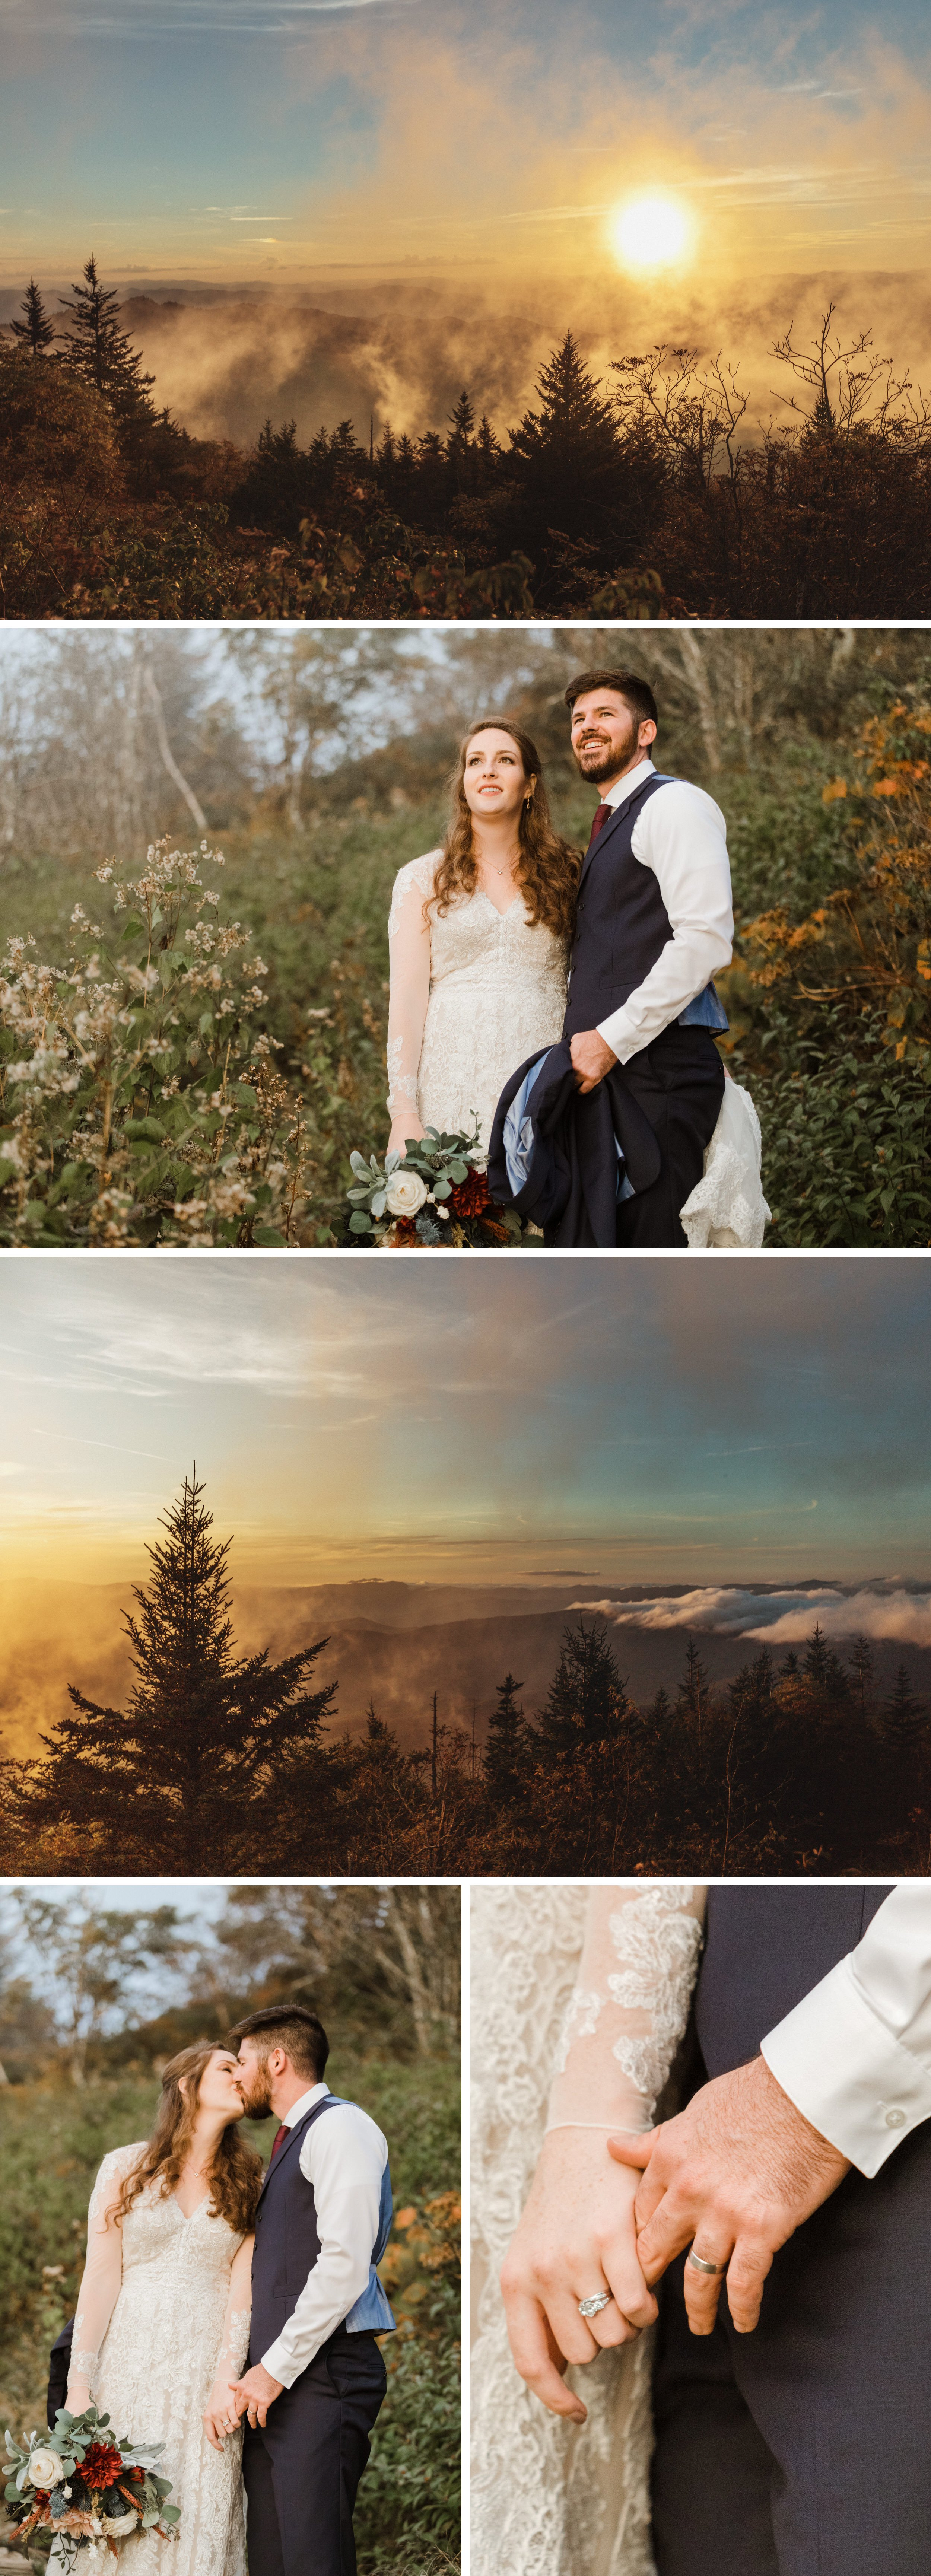 Great Smoky Mountain National Park Elopement- Cole + Rachel- Photographer Shaina DeCiryan-11.20186.jpg